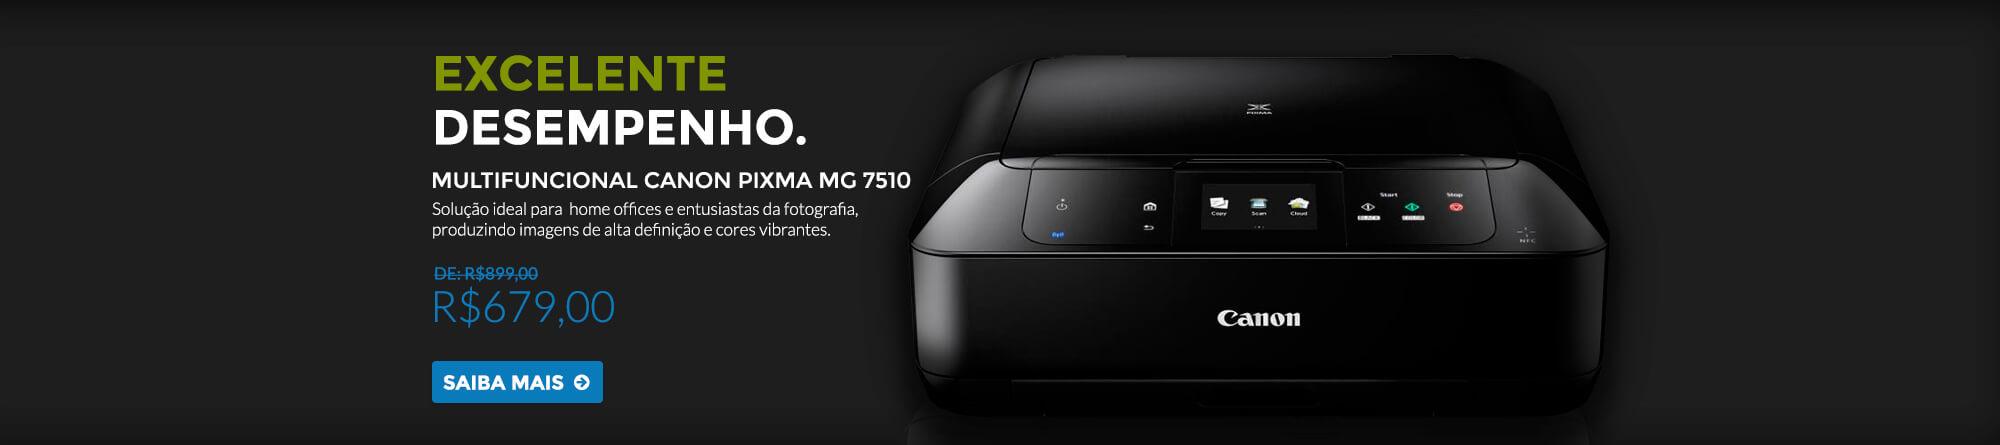 Canon mg7510